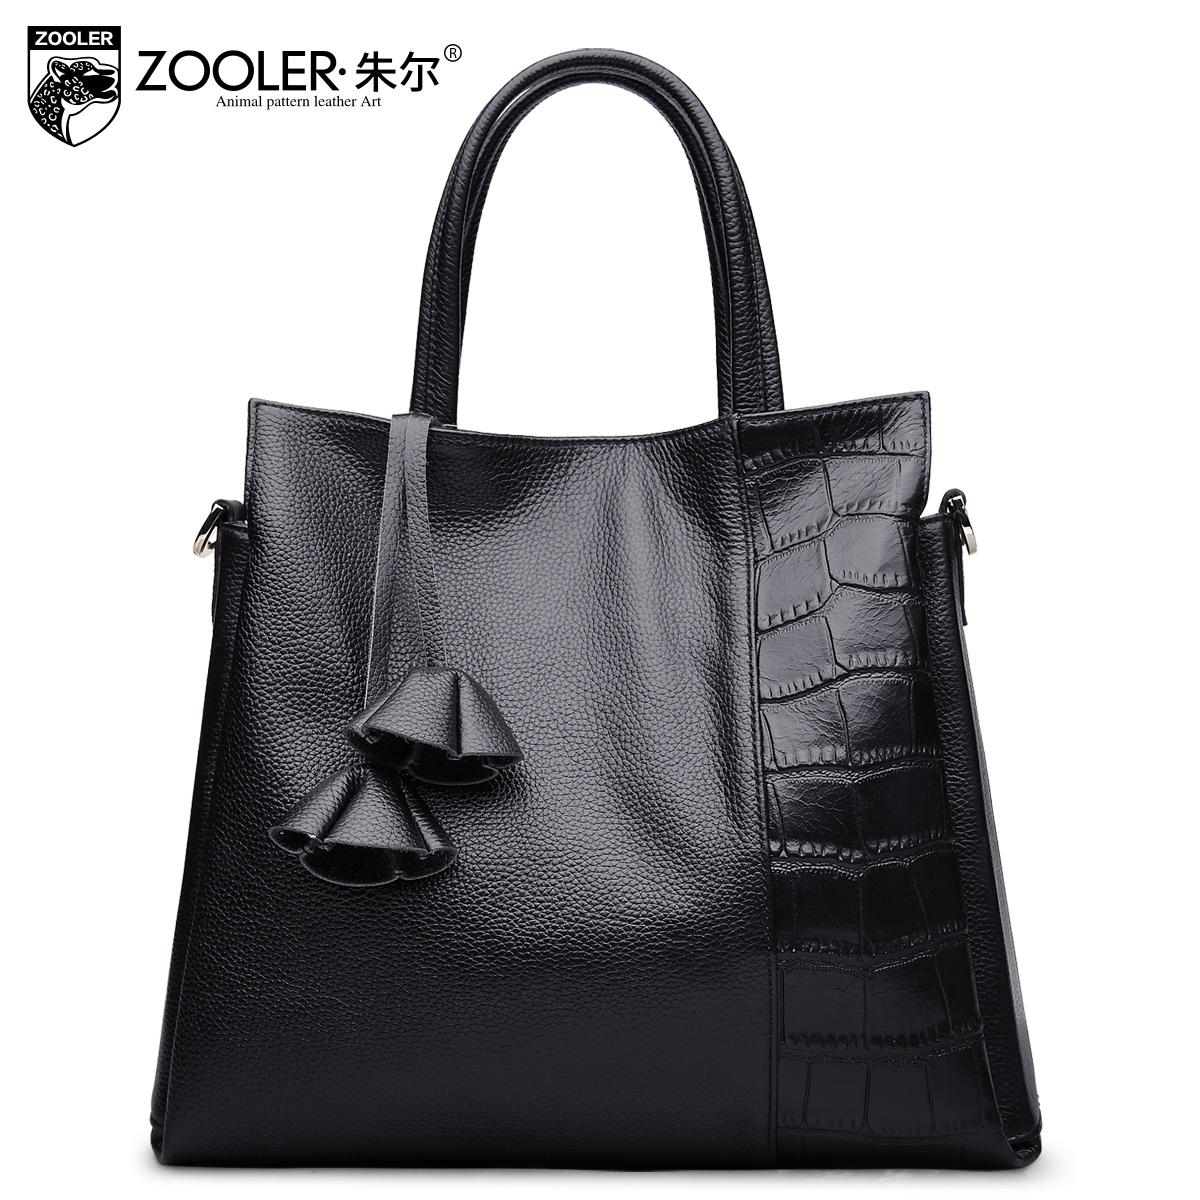 Jules brand new air leather handbag handbag 2016 leather female bag ladies European female spring